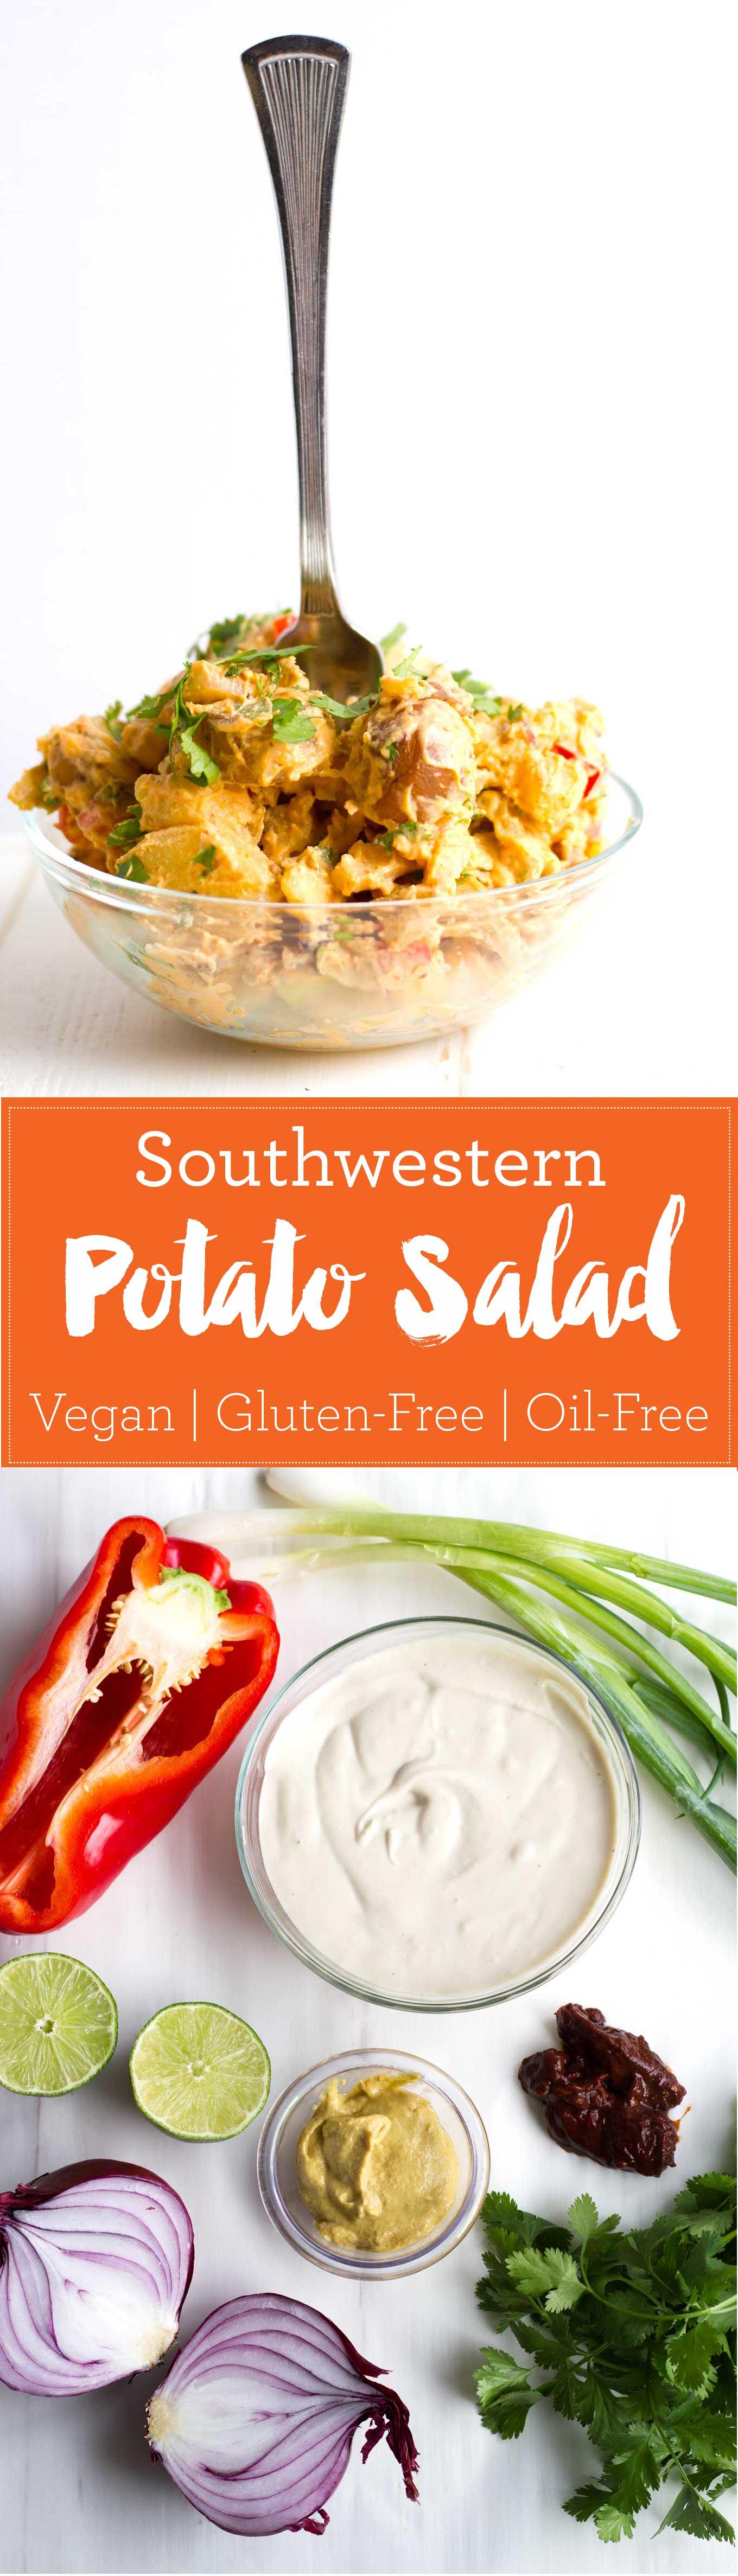 Vegan Southwestern Potato Salad | Oil-Free, Gluten-Free | https://eatwithinyourmeans.com